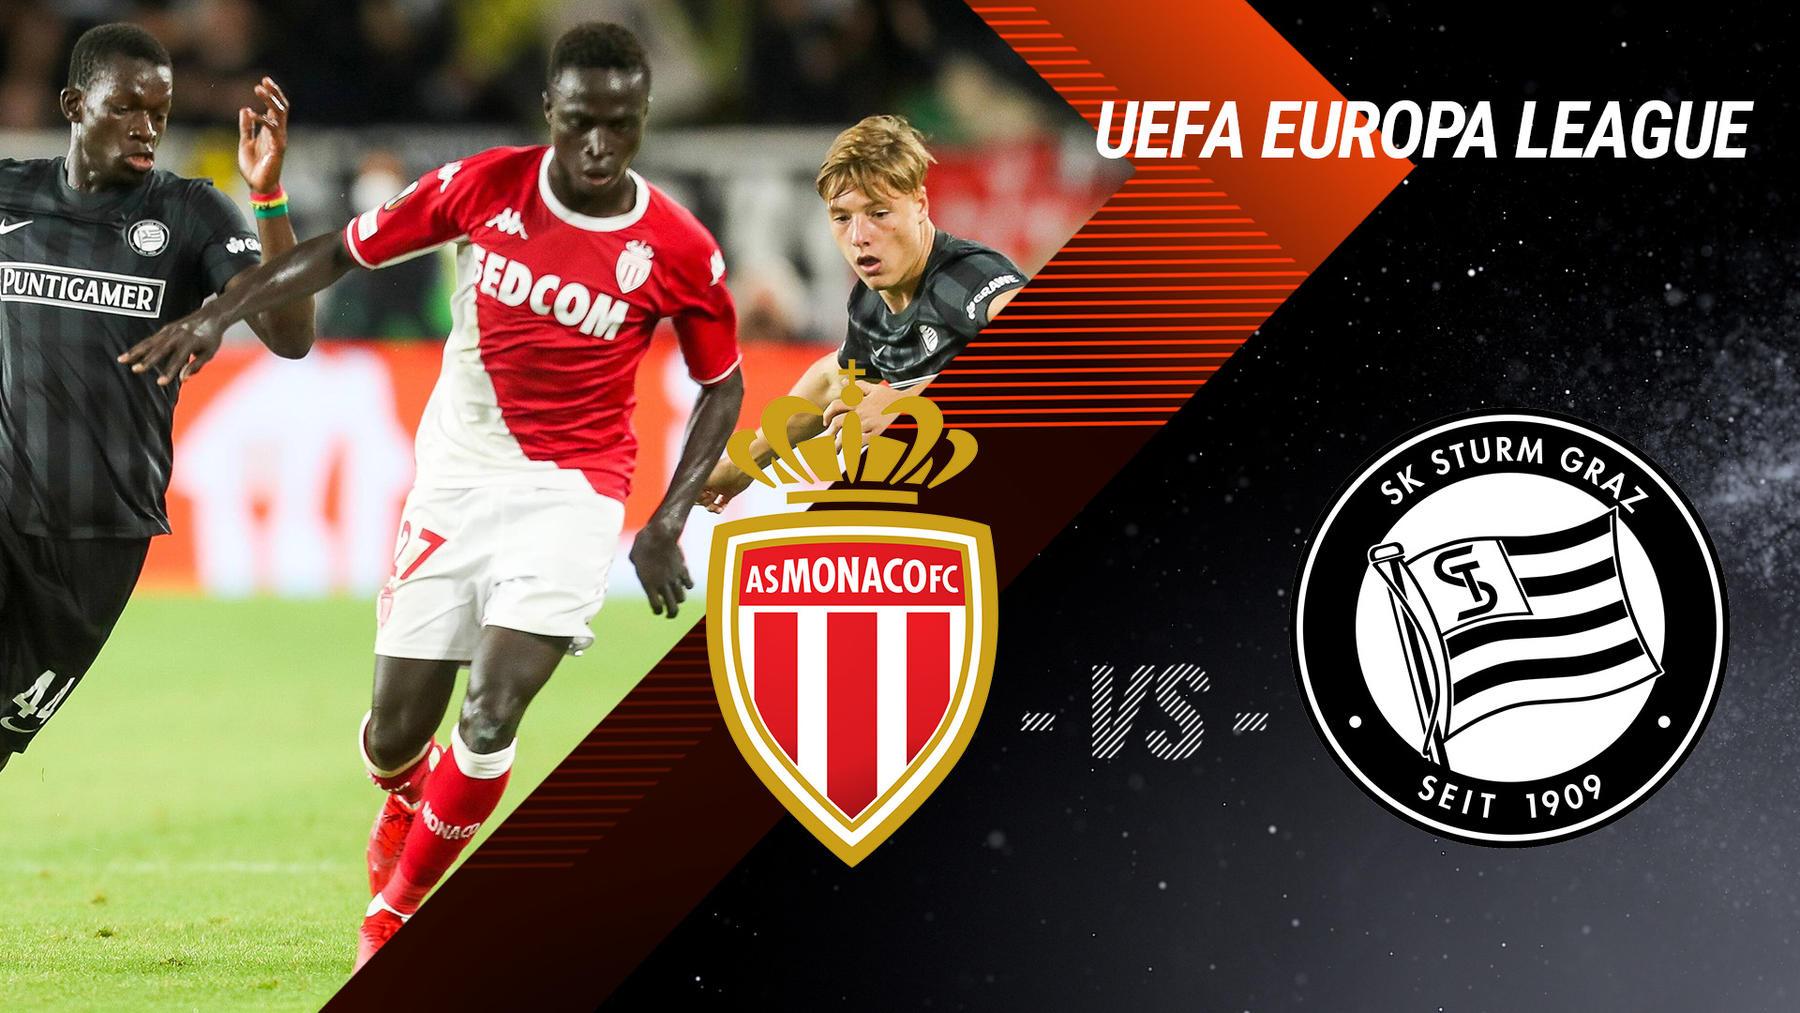 Highlights: AS Monaco vs. Sturm Graz   Folge 6